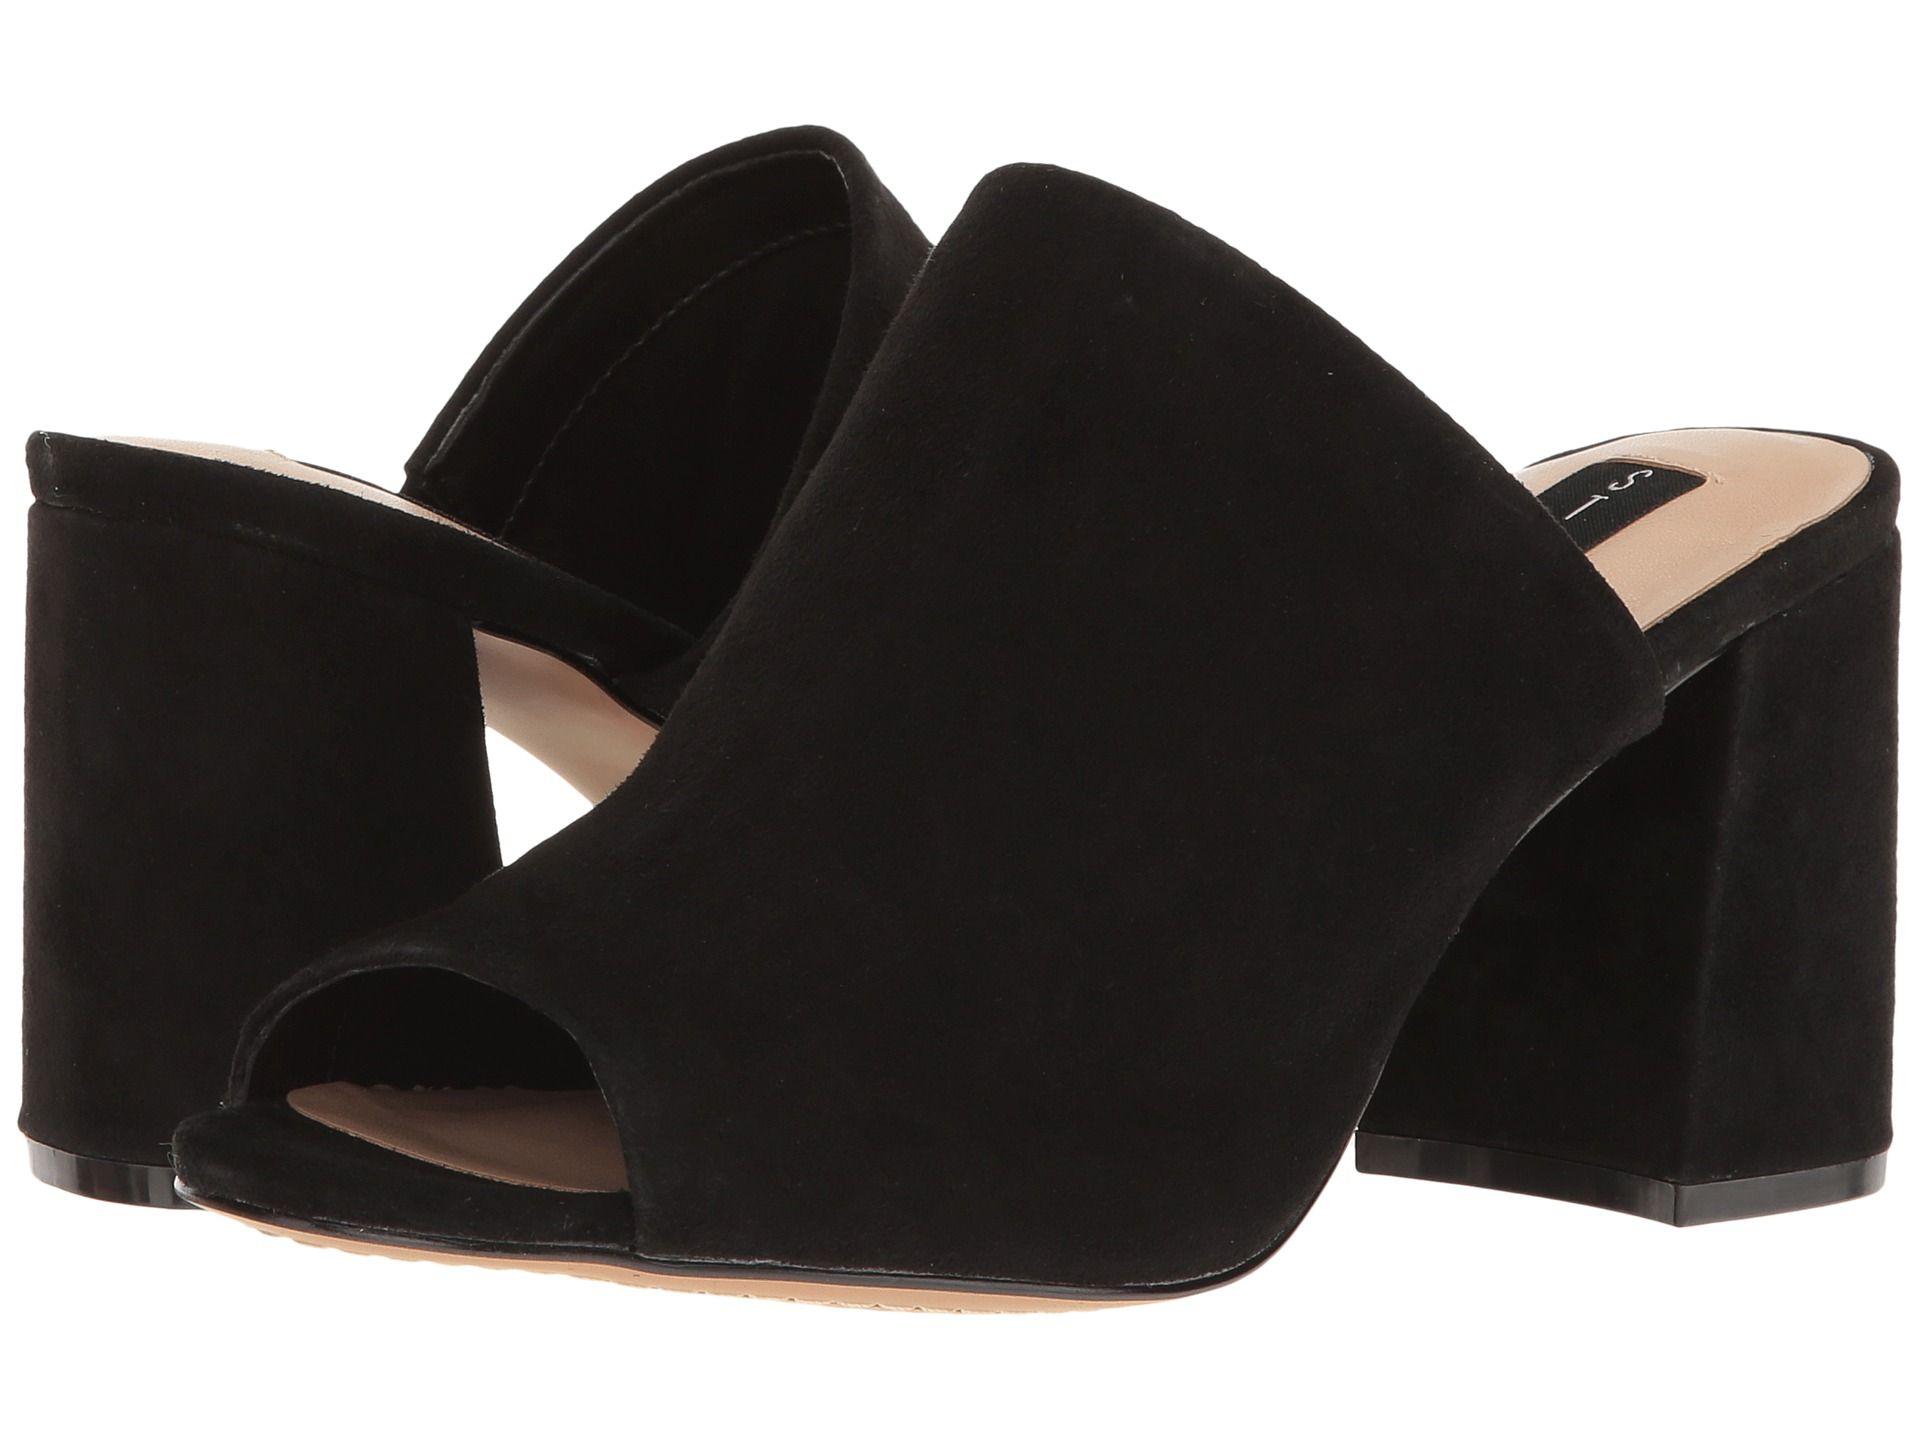 Steven Fume Black Suede Womens Shoes